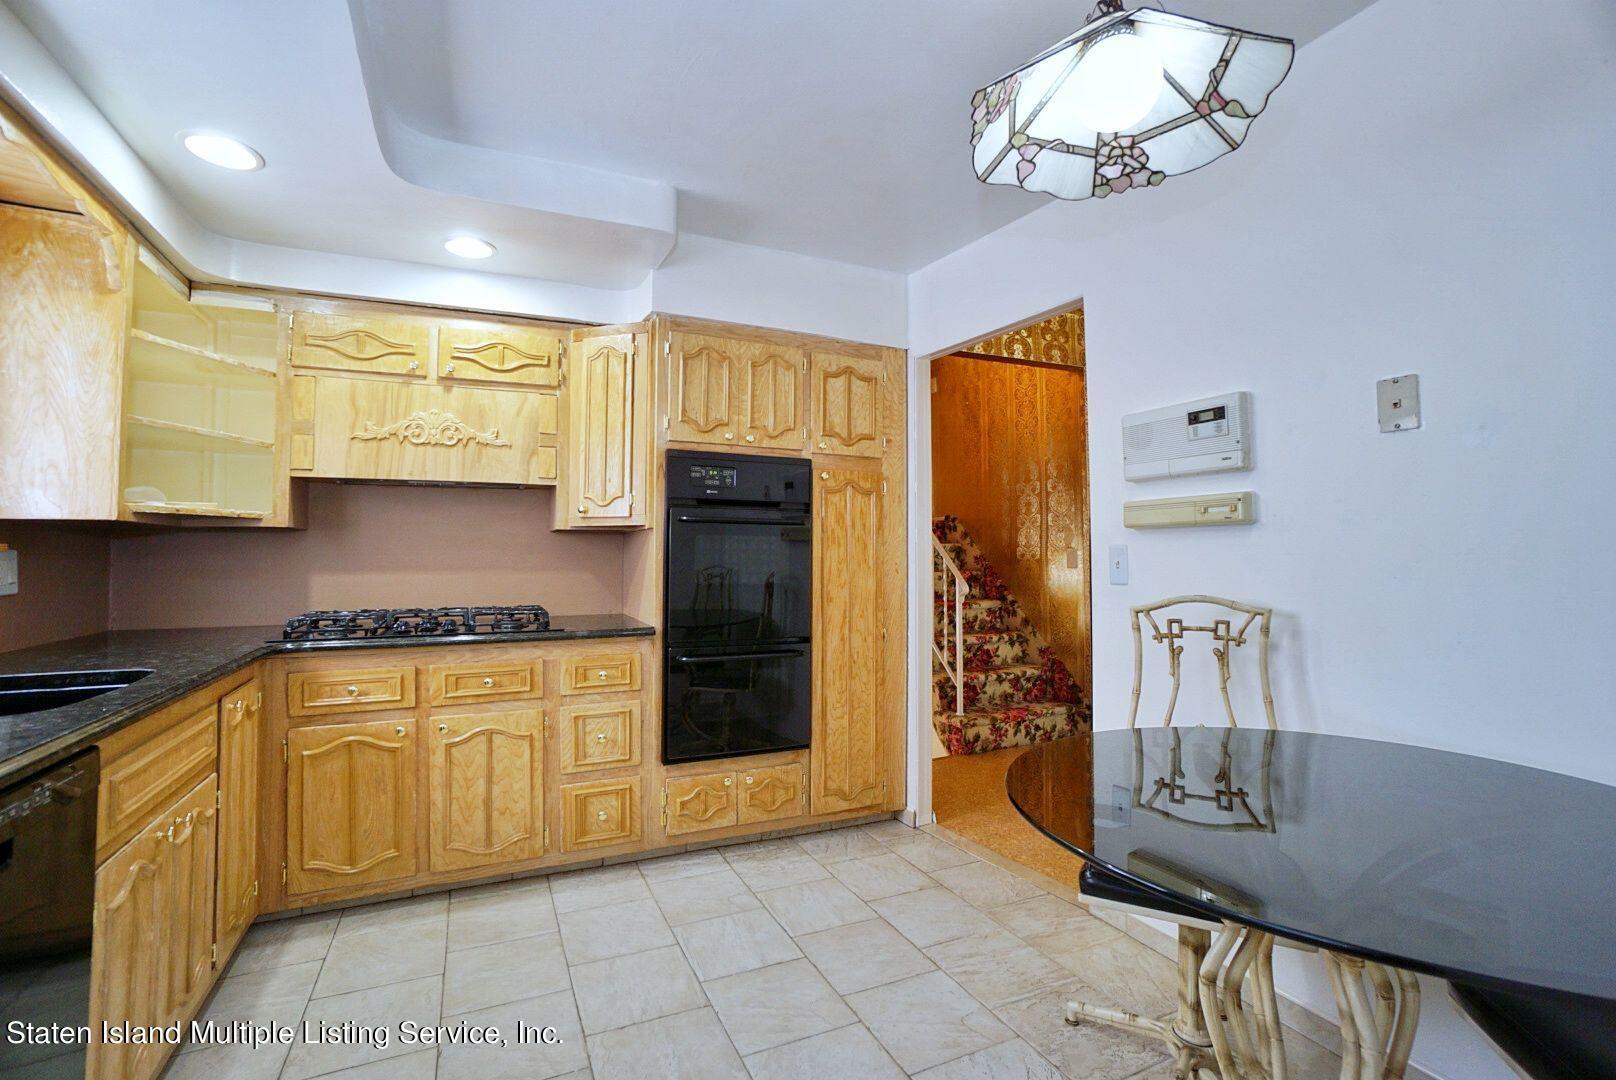 Single Family - Detached 94 Cranford Avenue  Staten Island, NY 10306, MLS-1146620-14